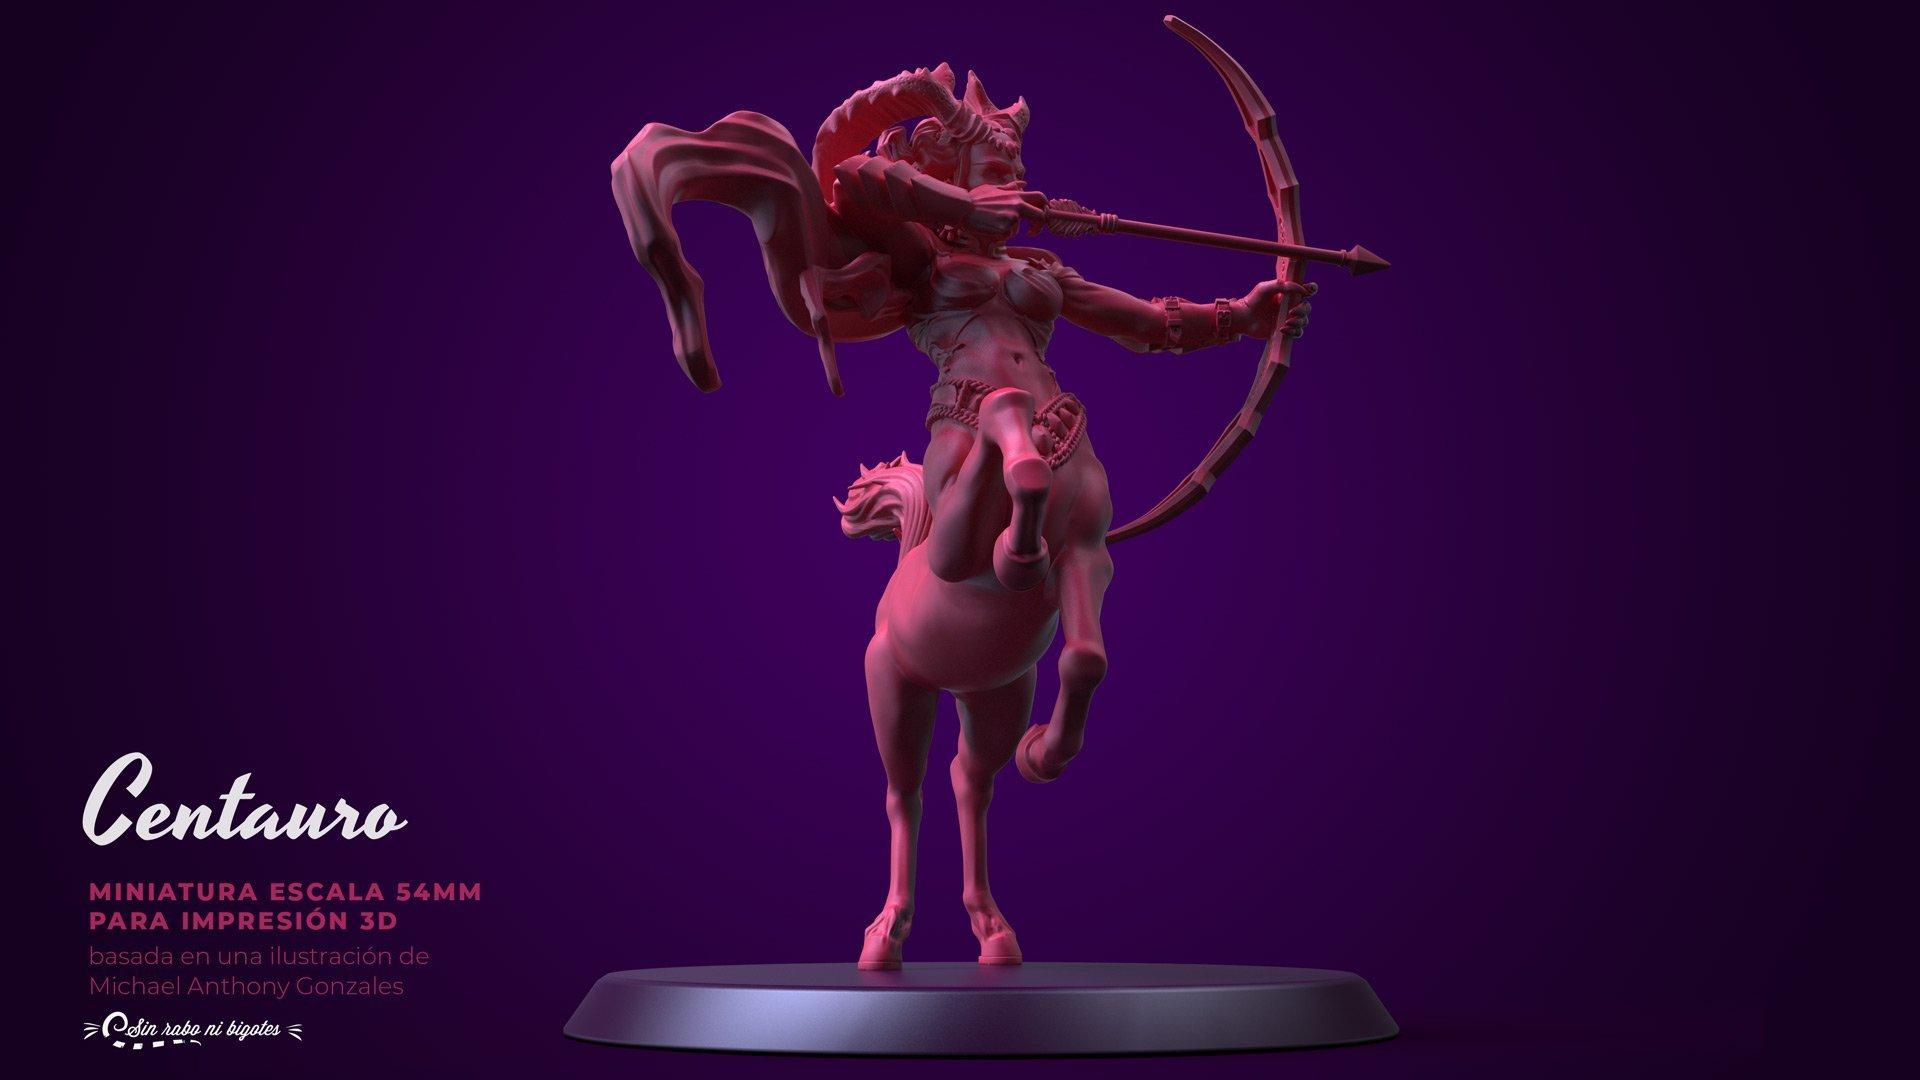 centauro arquera miniatura furry personalizada para impresion 3d